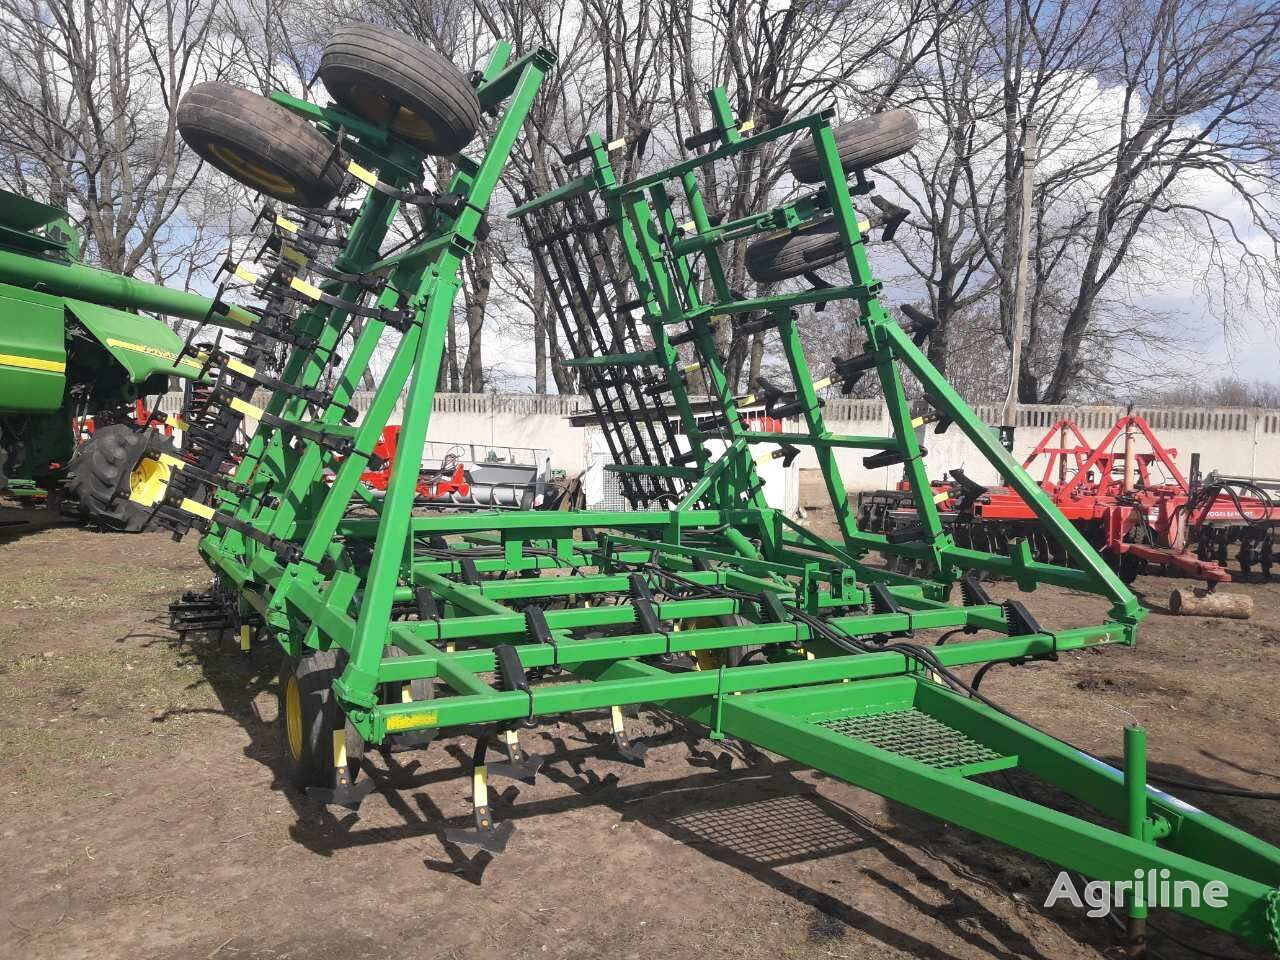 cultivateur JOHN DEERE 960  8,5m pod 190l.s. Otsrochka oplaty!!!